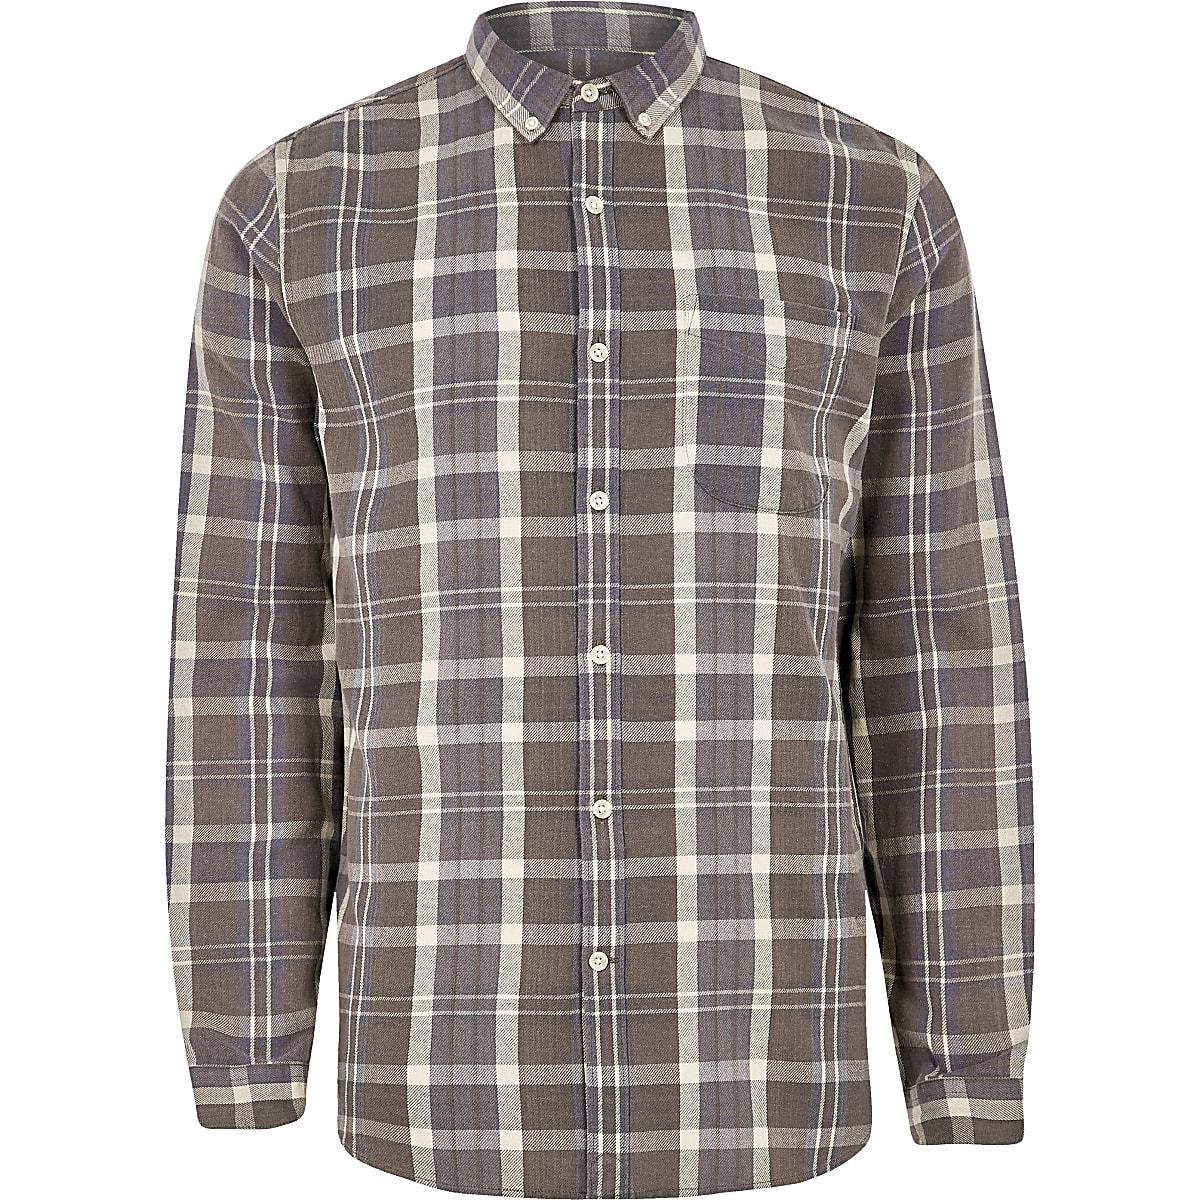 Brown check button-down long sleeve shirt